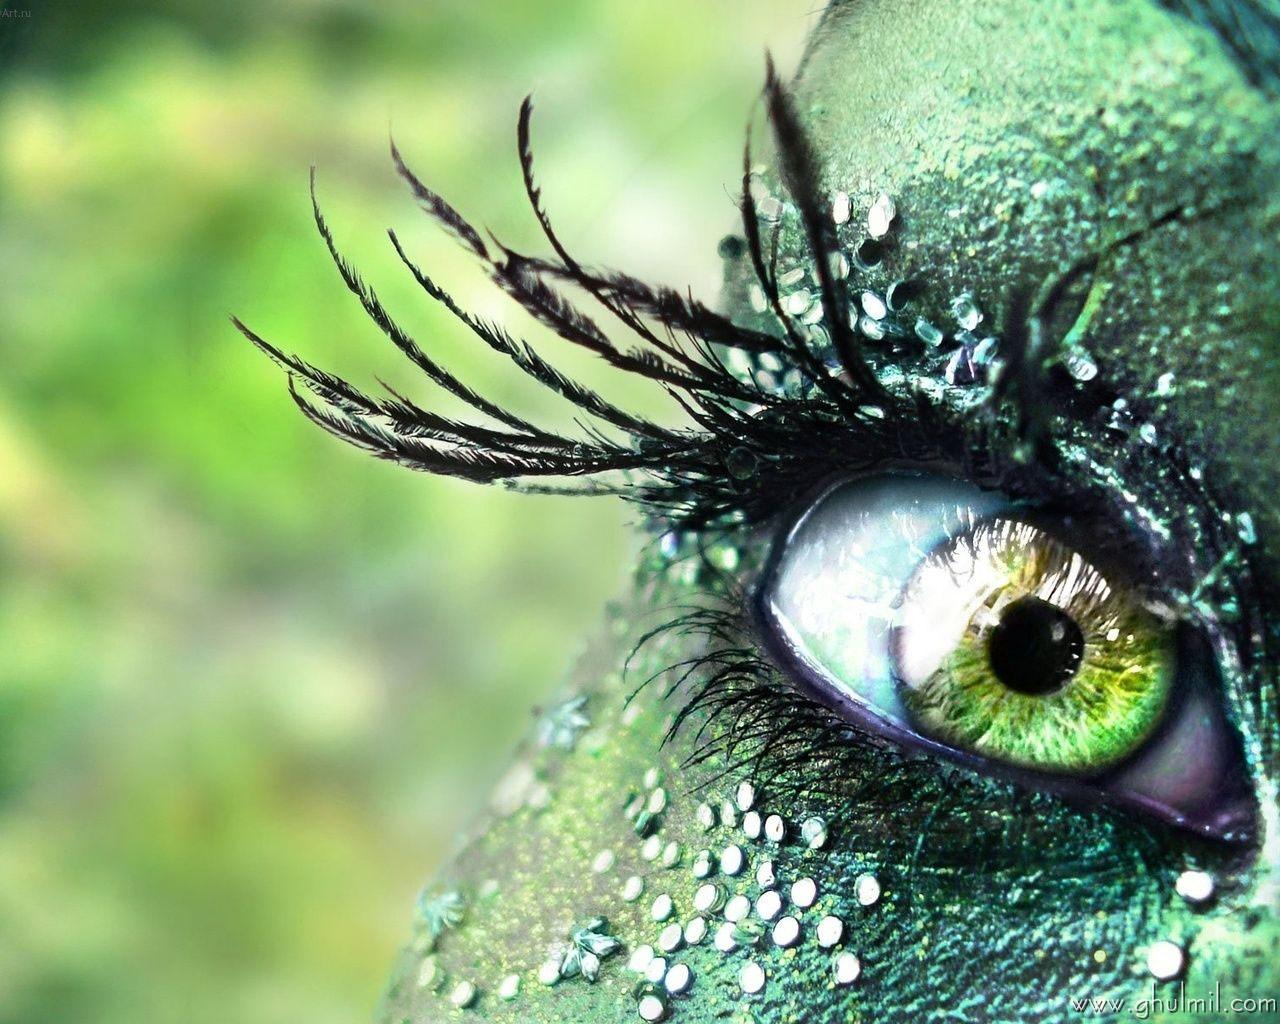 http://4.bp.blogspot.com/-A2JUOZlYwL4/UC-02VKhBlI/AAAAAAAAAEM/ZA50W8Irh2Q/s1600/beautiful-colorful-3d-hd-eye-wallpaper-for-desktops.jpg